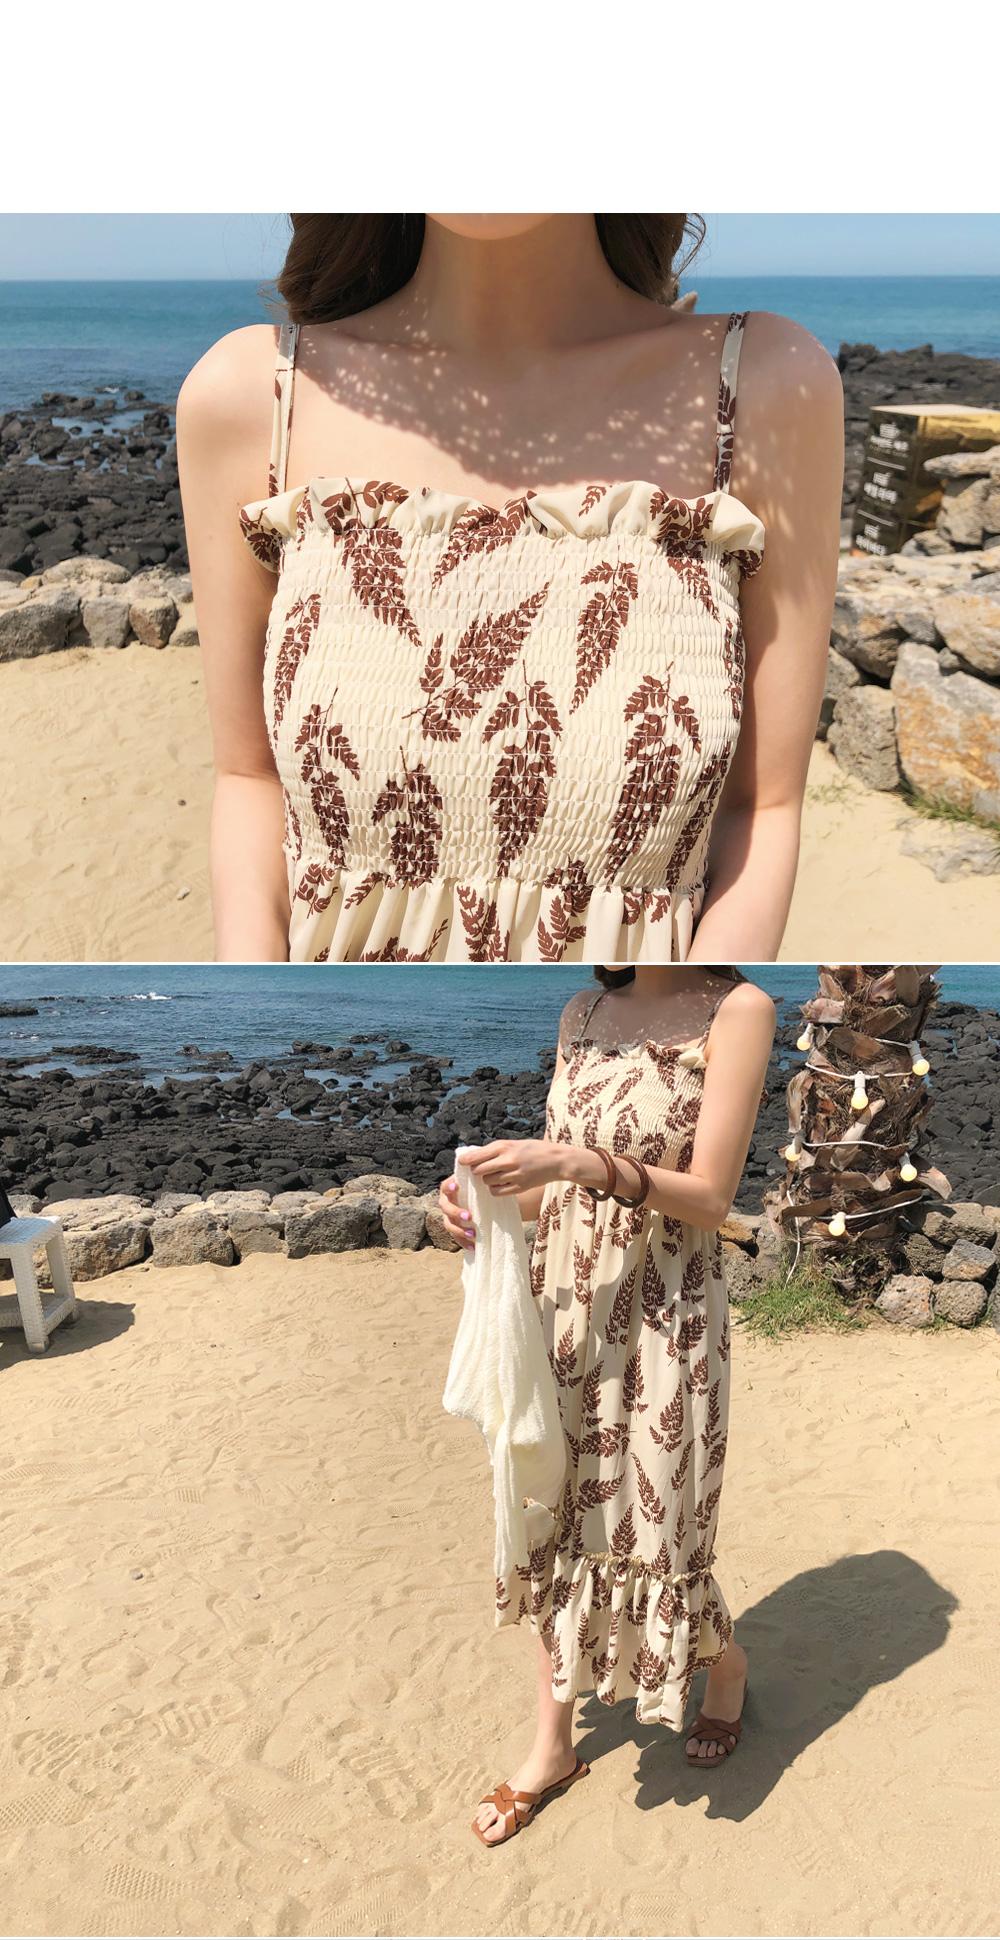 Leaf smoked dress